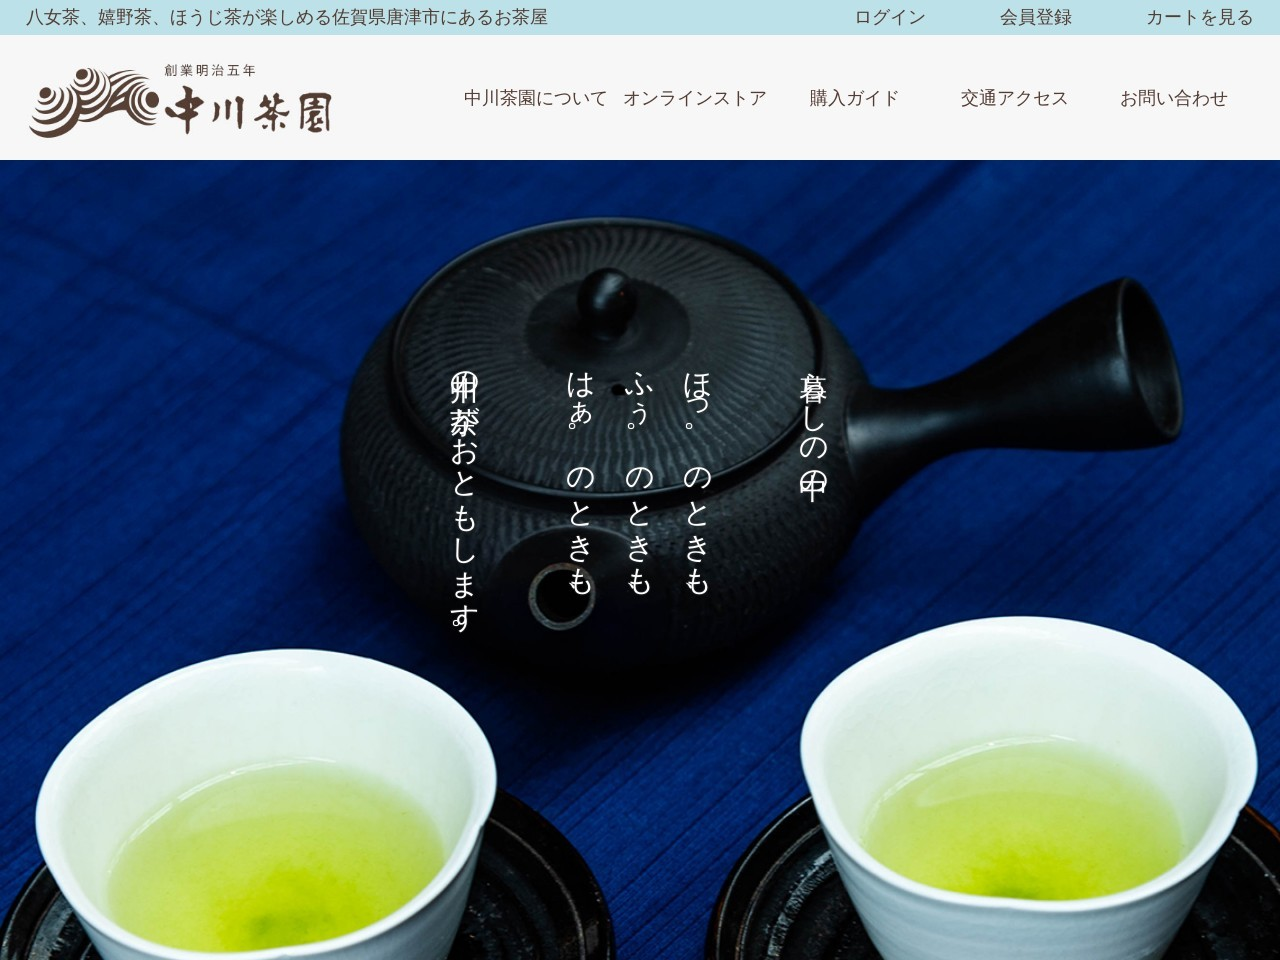 中川茶園~佐賀県唐津のお茶専門店(八女茶・嬉野茶)